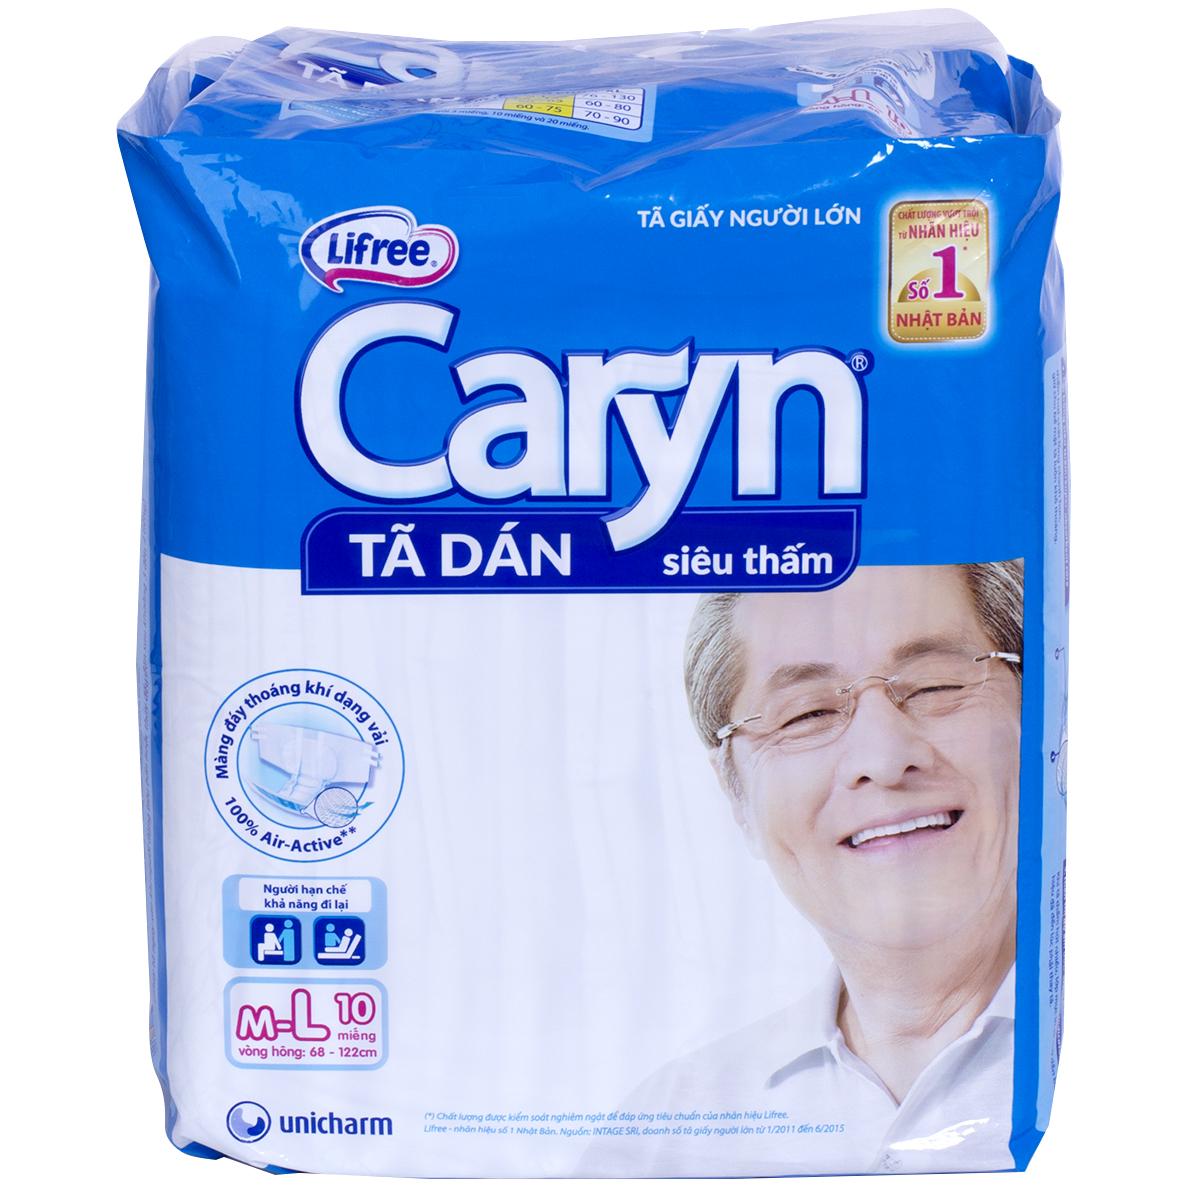 Ta giay nguoi lon Caryn